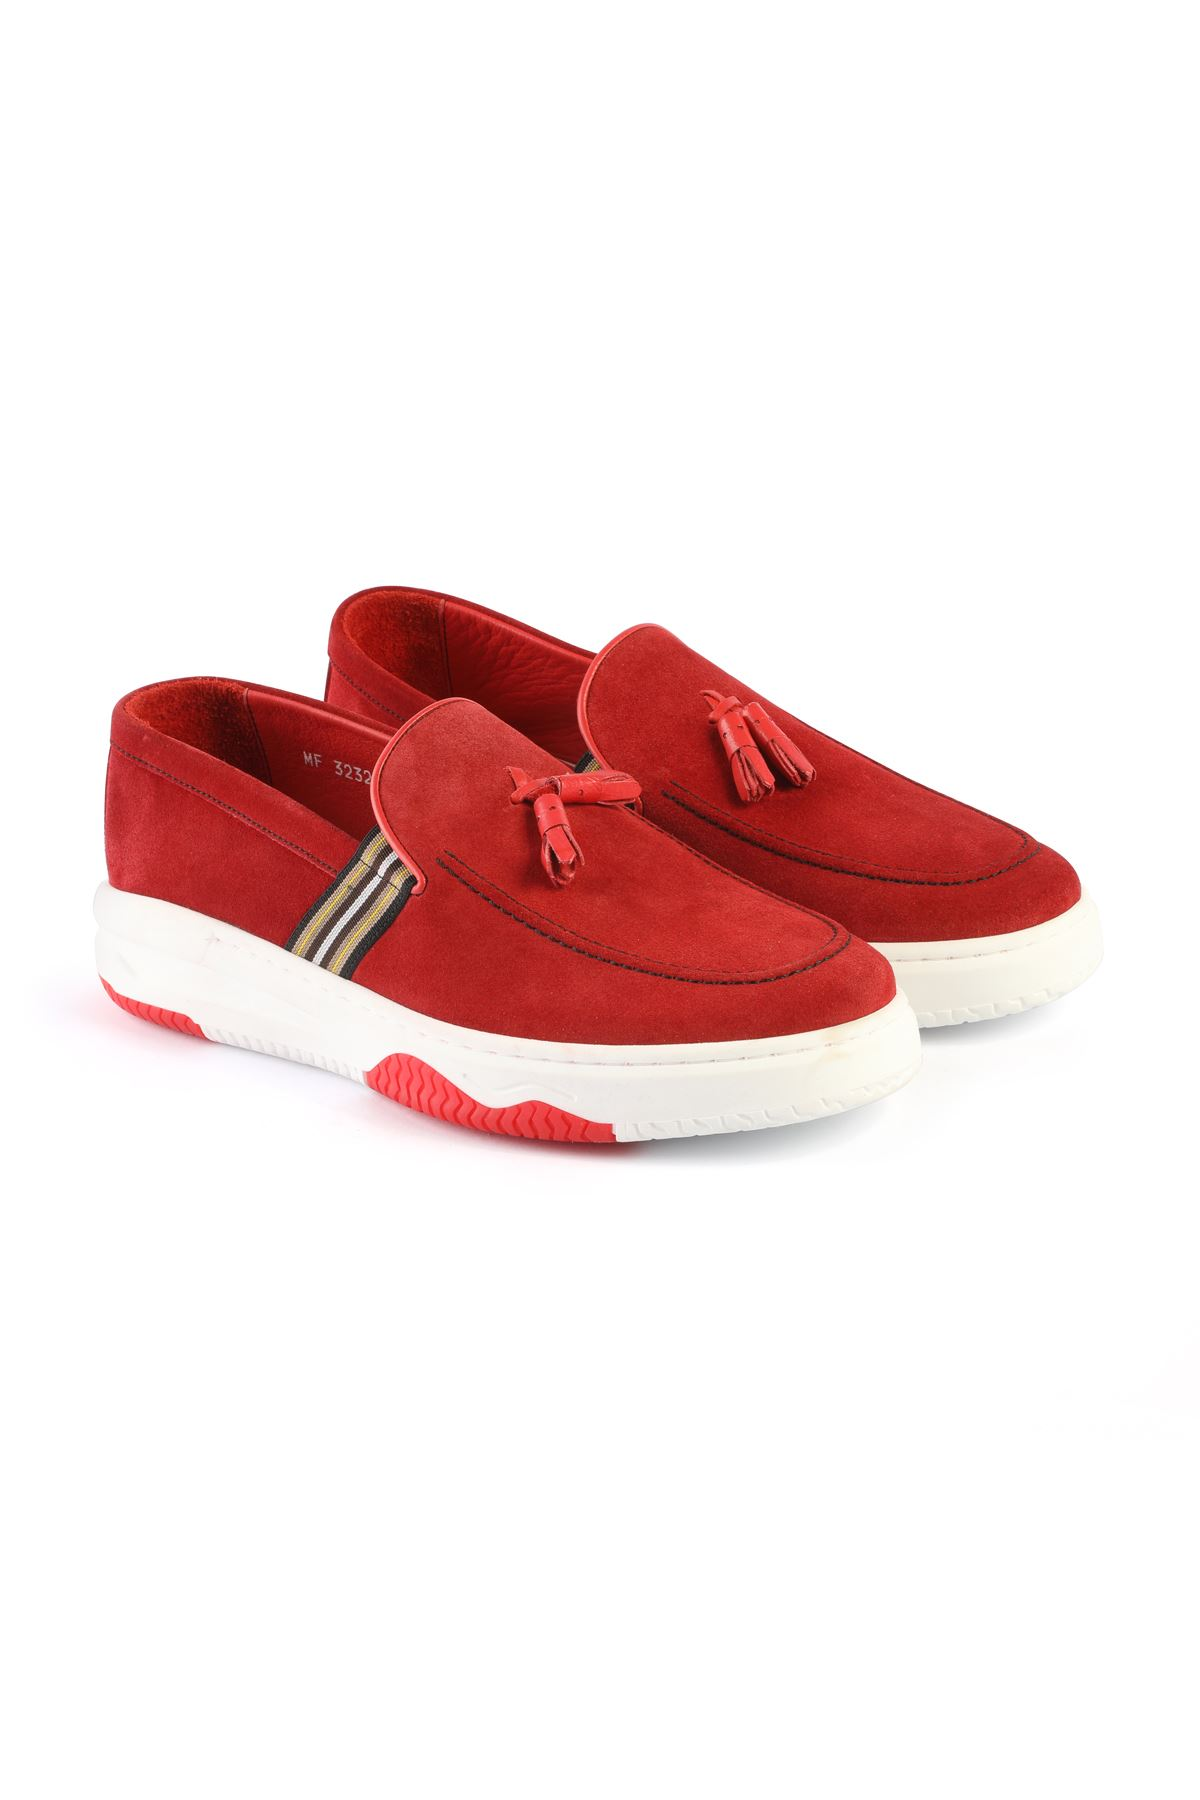 Libero L3232 Cream Loafer Shoes